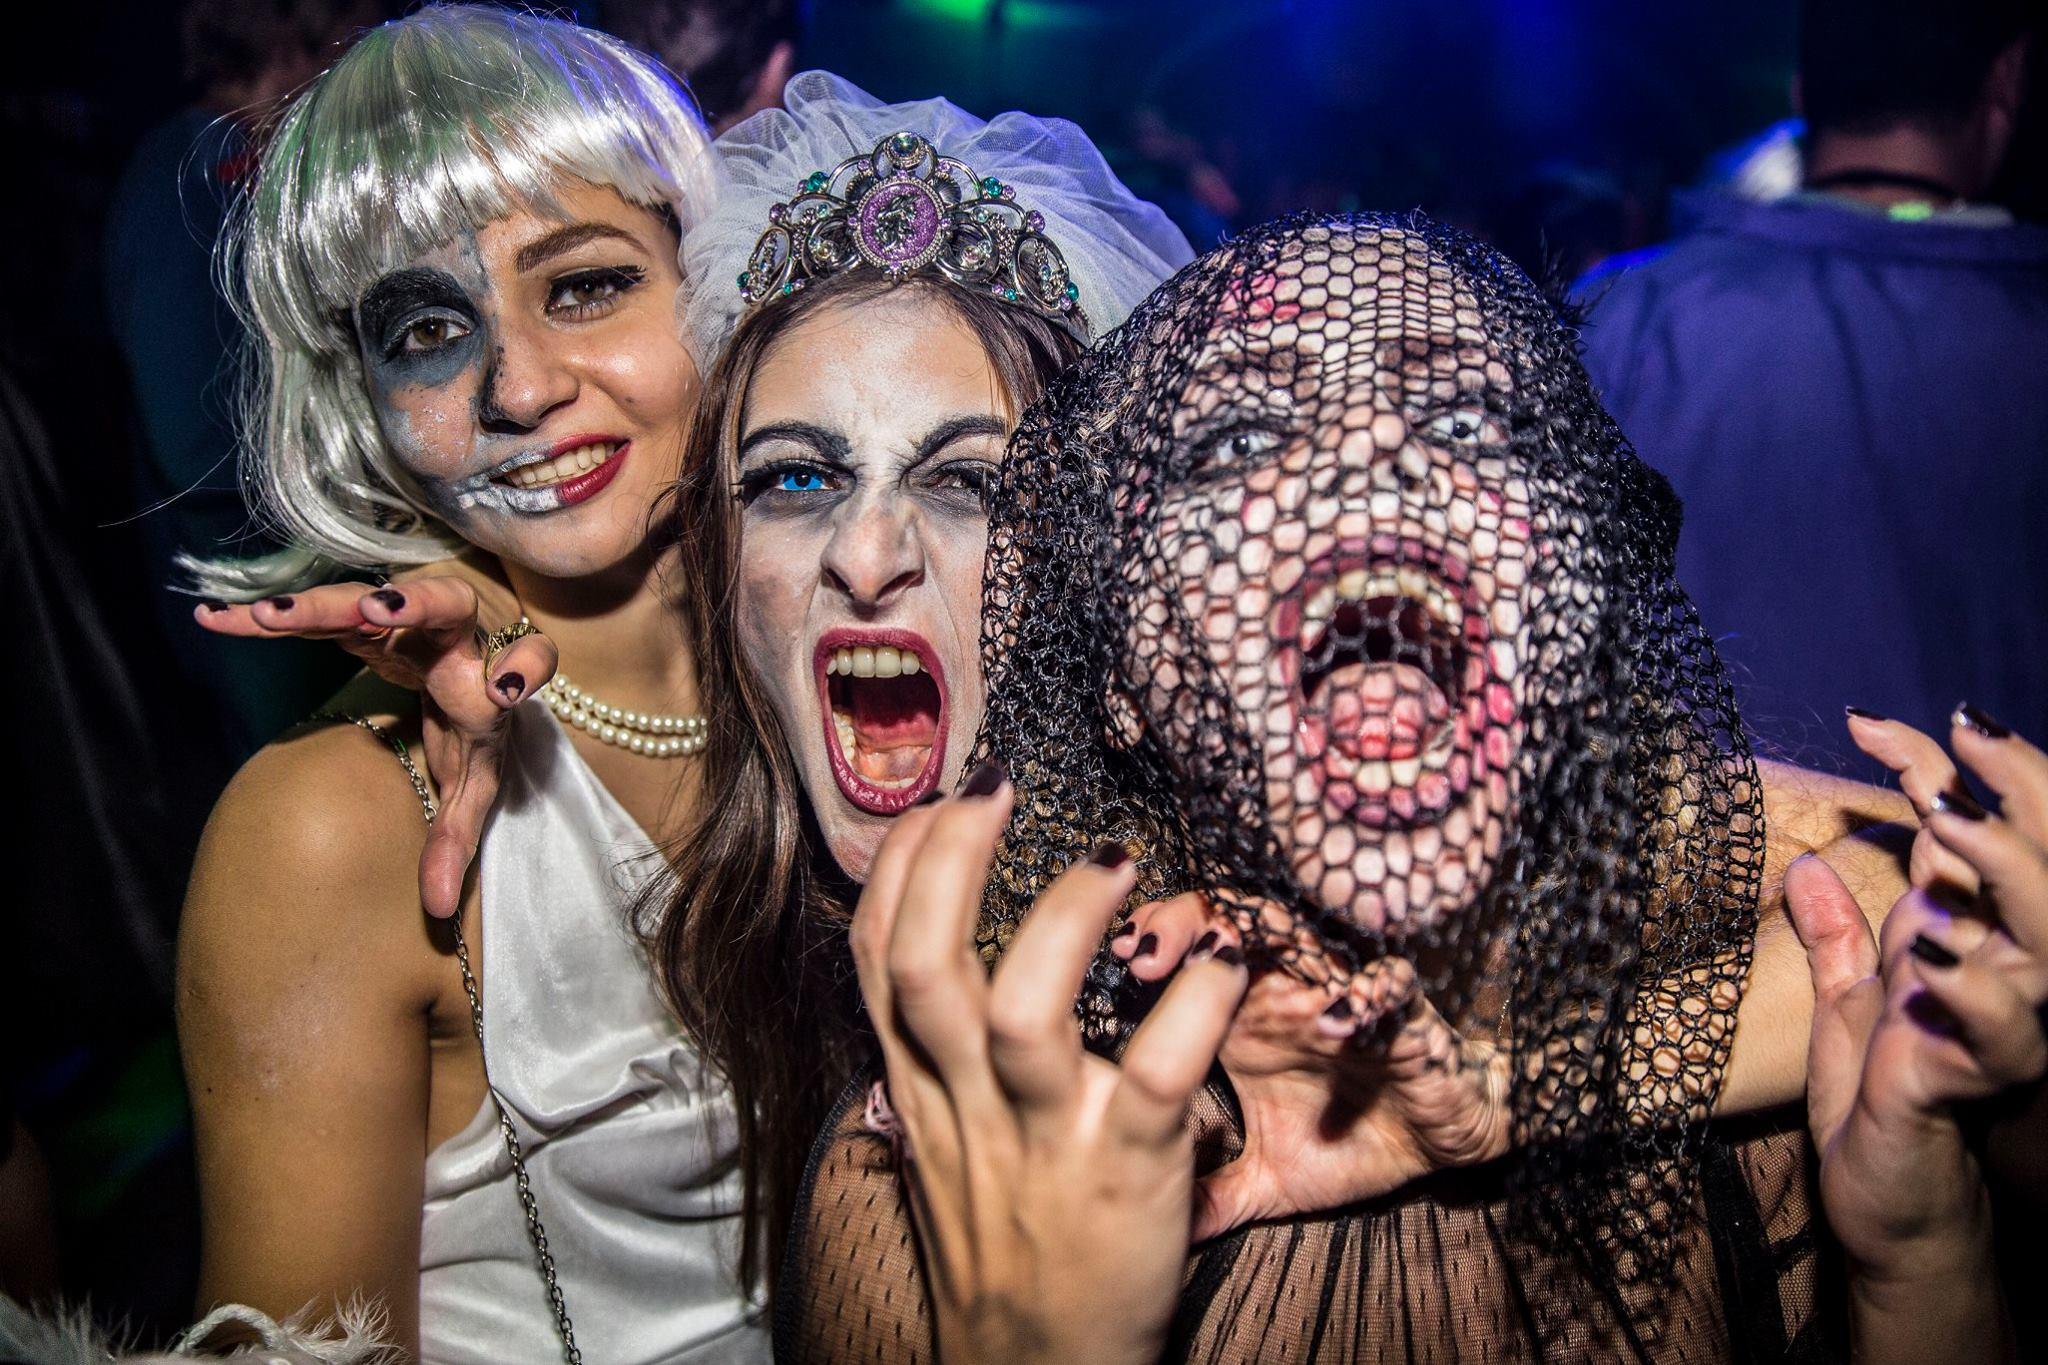 Halloween Feest.Amsterdam Halloween 2019 A Japanese Horror Story Westerunie